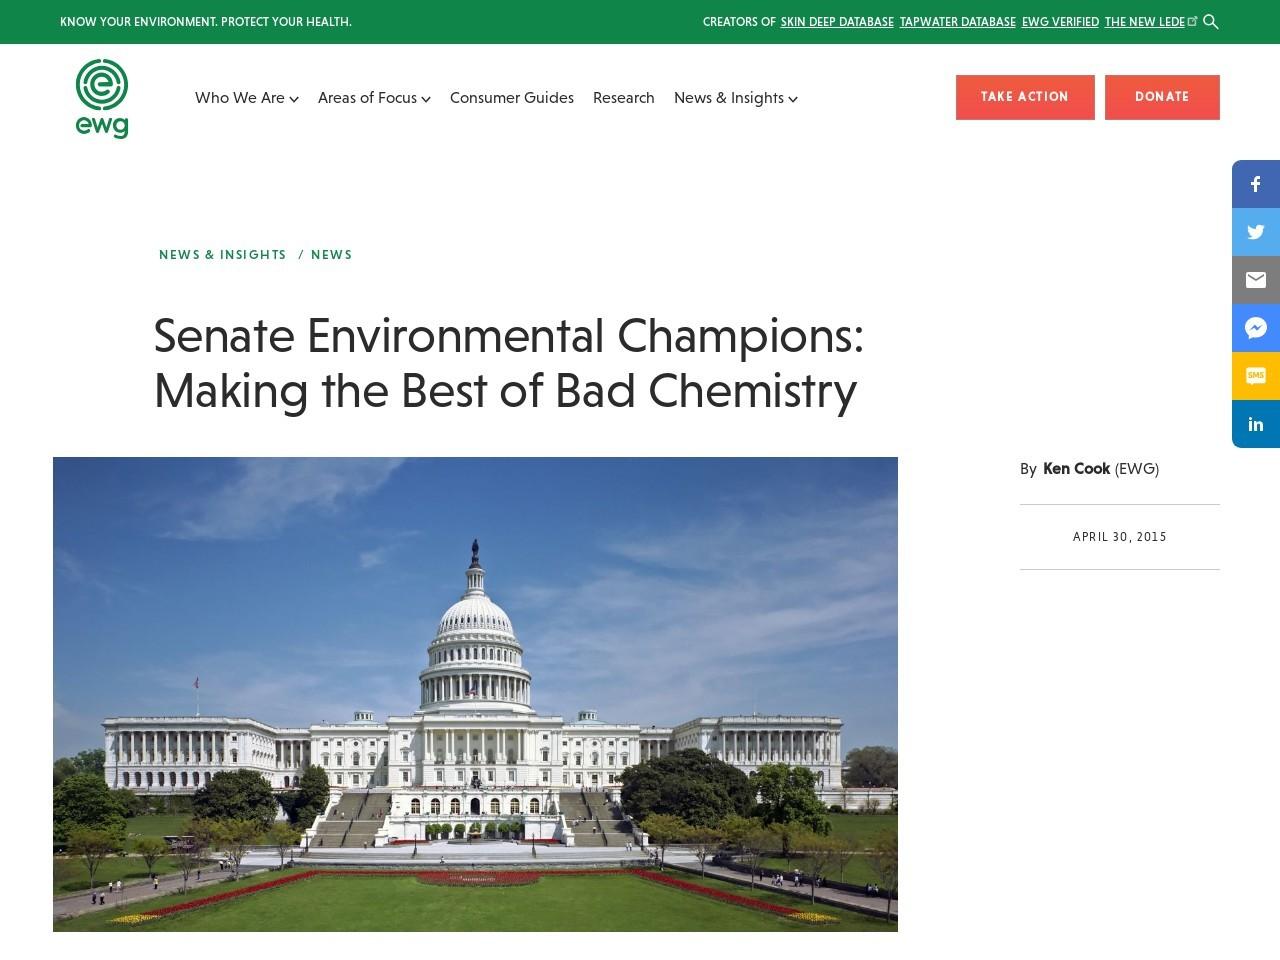 Senate Environmental Champions: Making the Best of Bad Chemistry